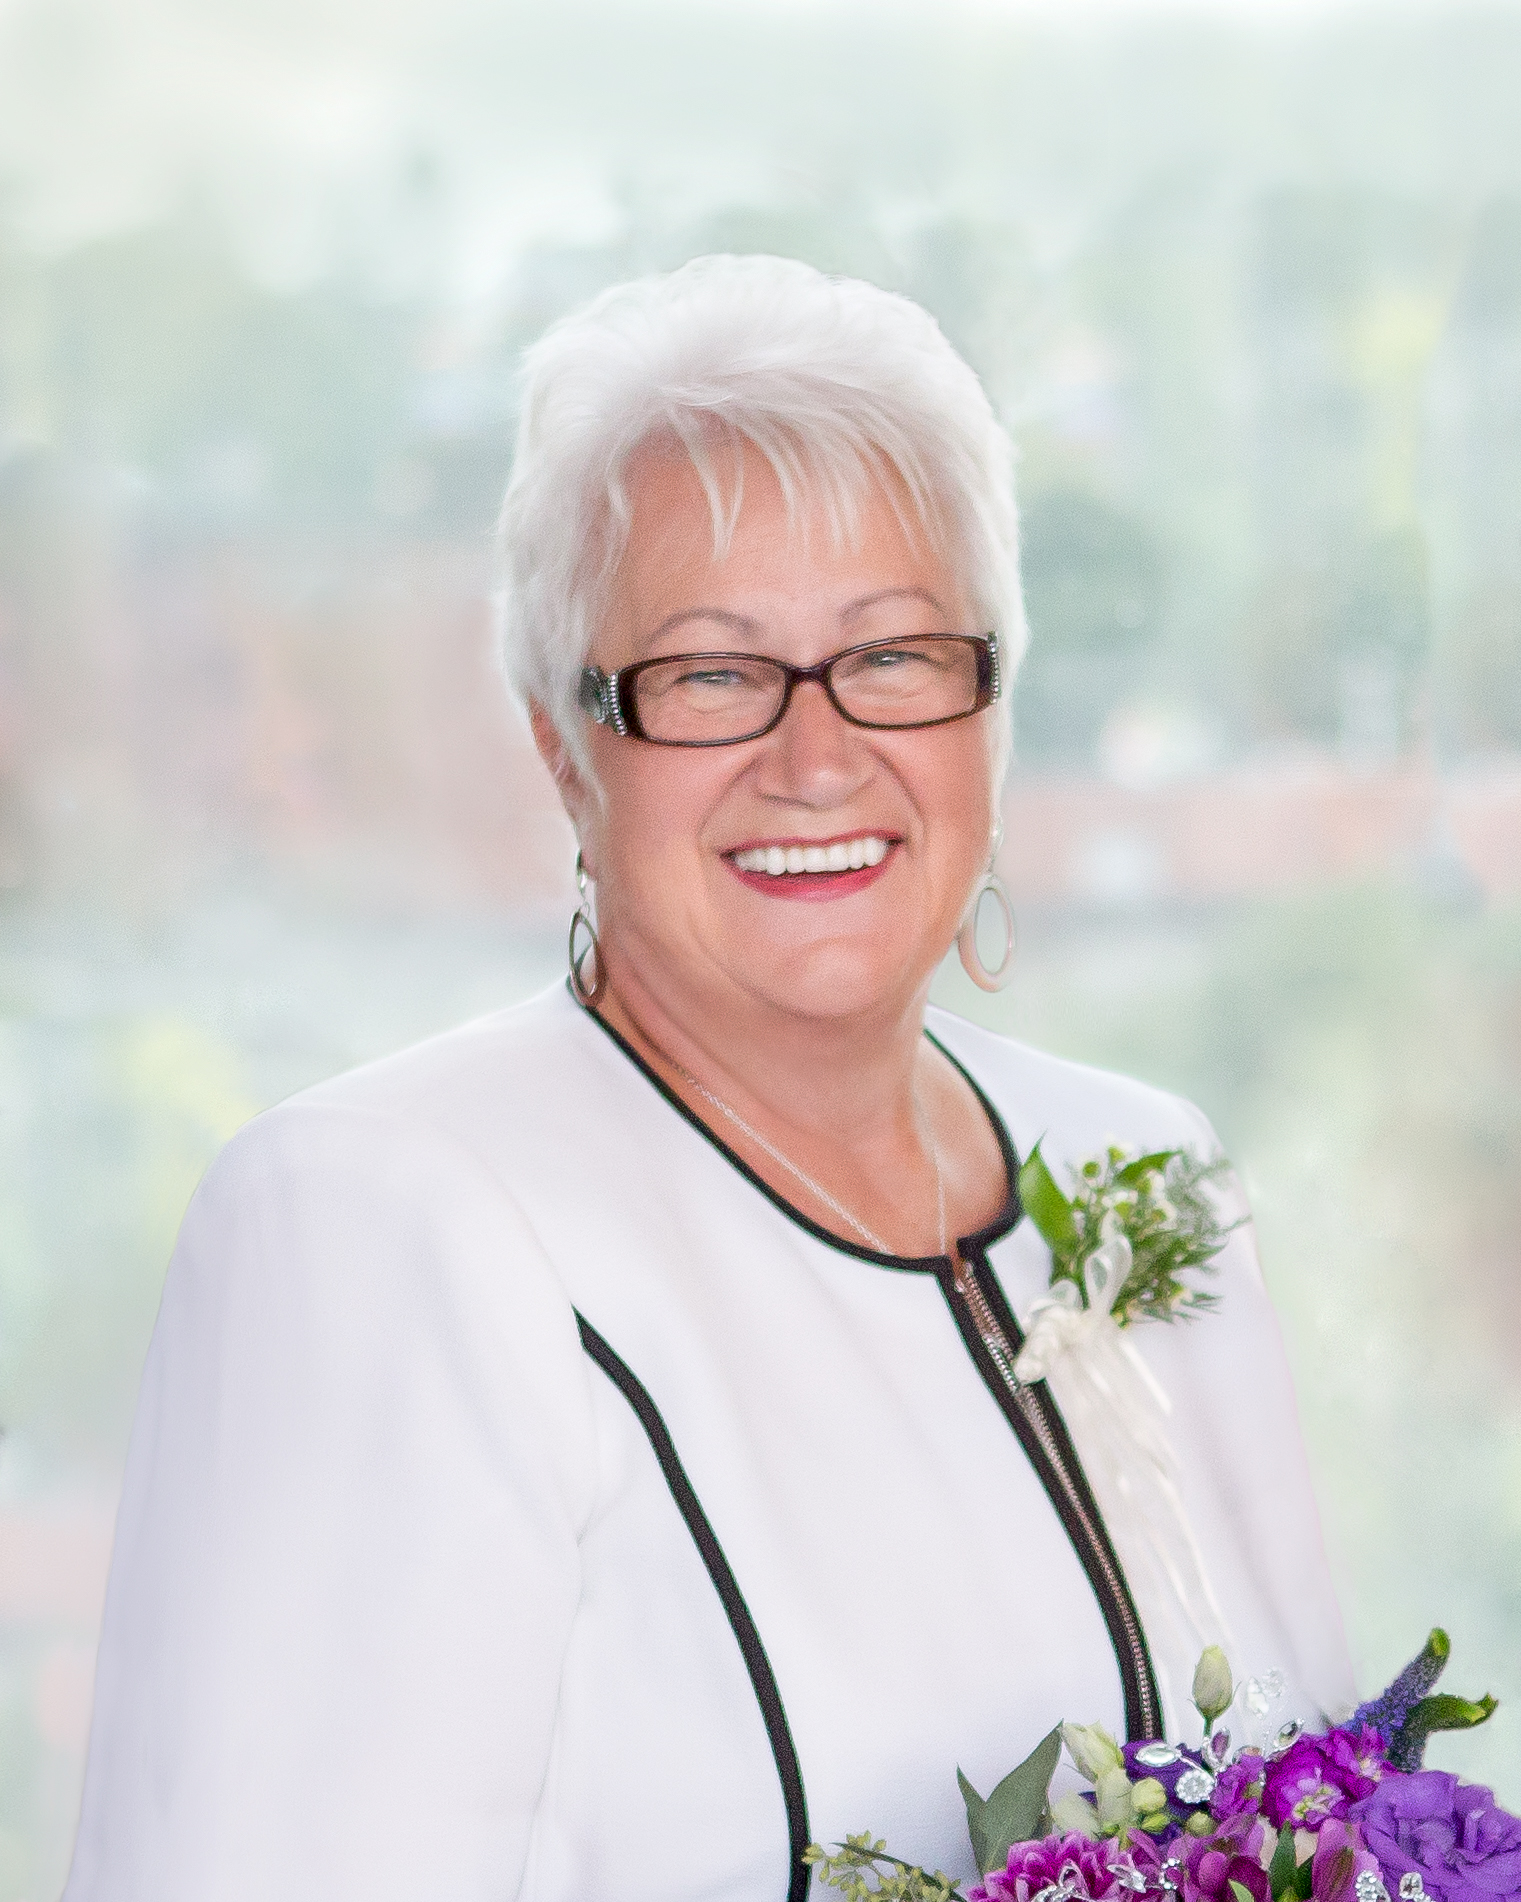 WALPER: Pamela (Pam) Joyce (van der Wiel) of Exeter